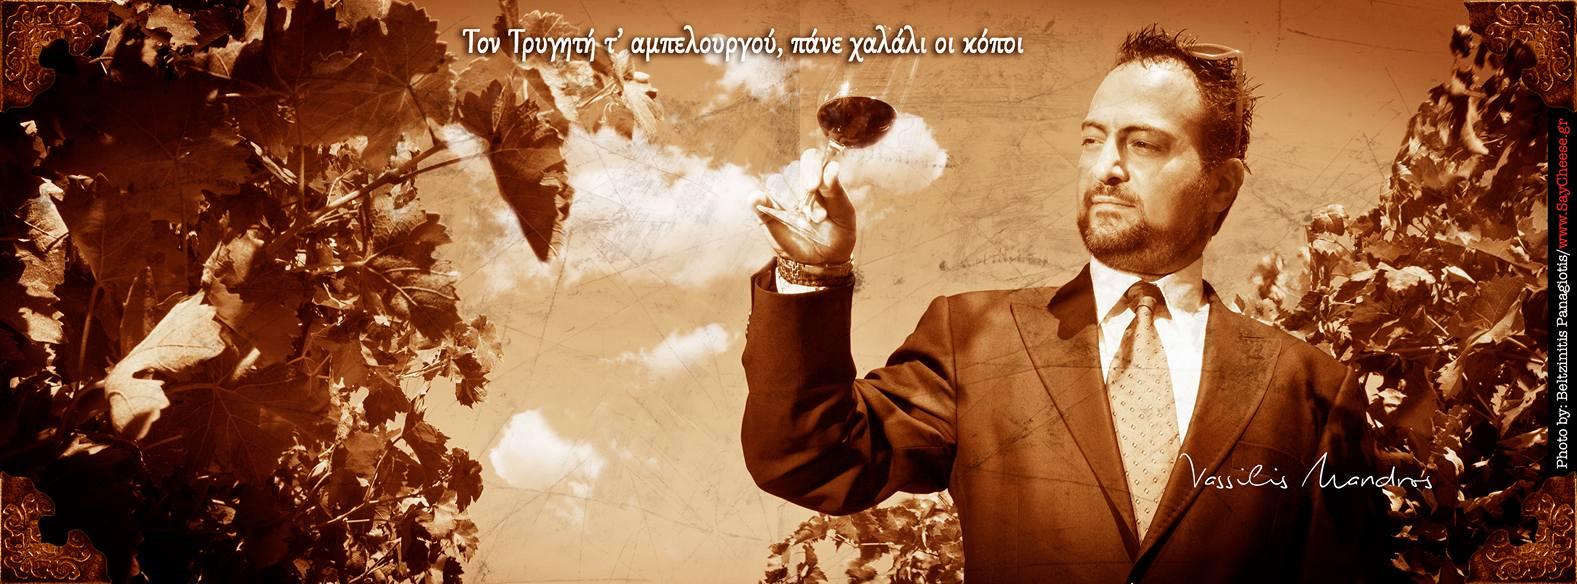 Vassilis Mandros 2.jpg